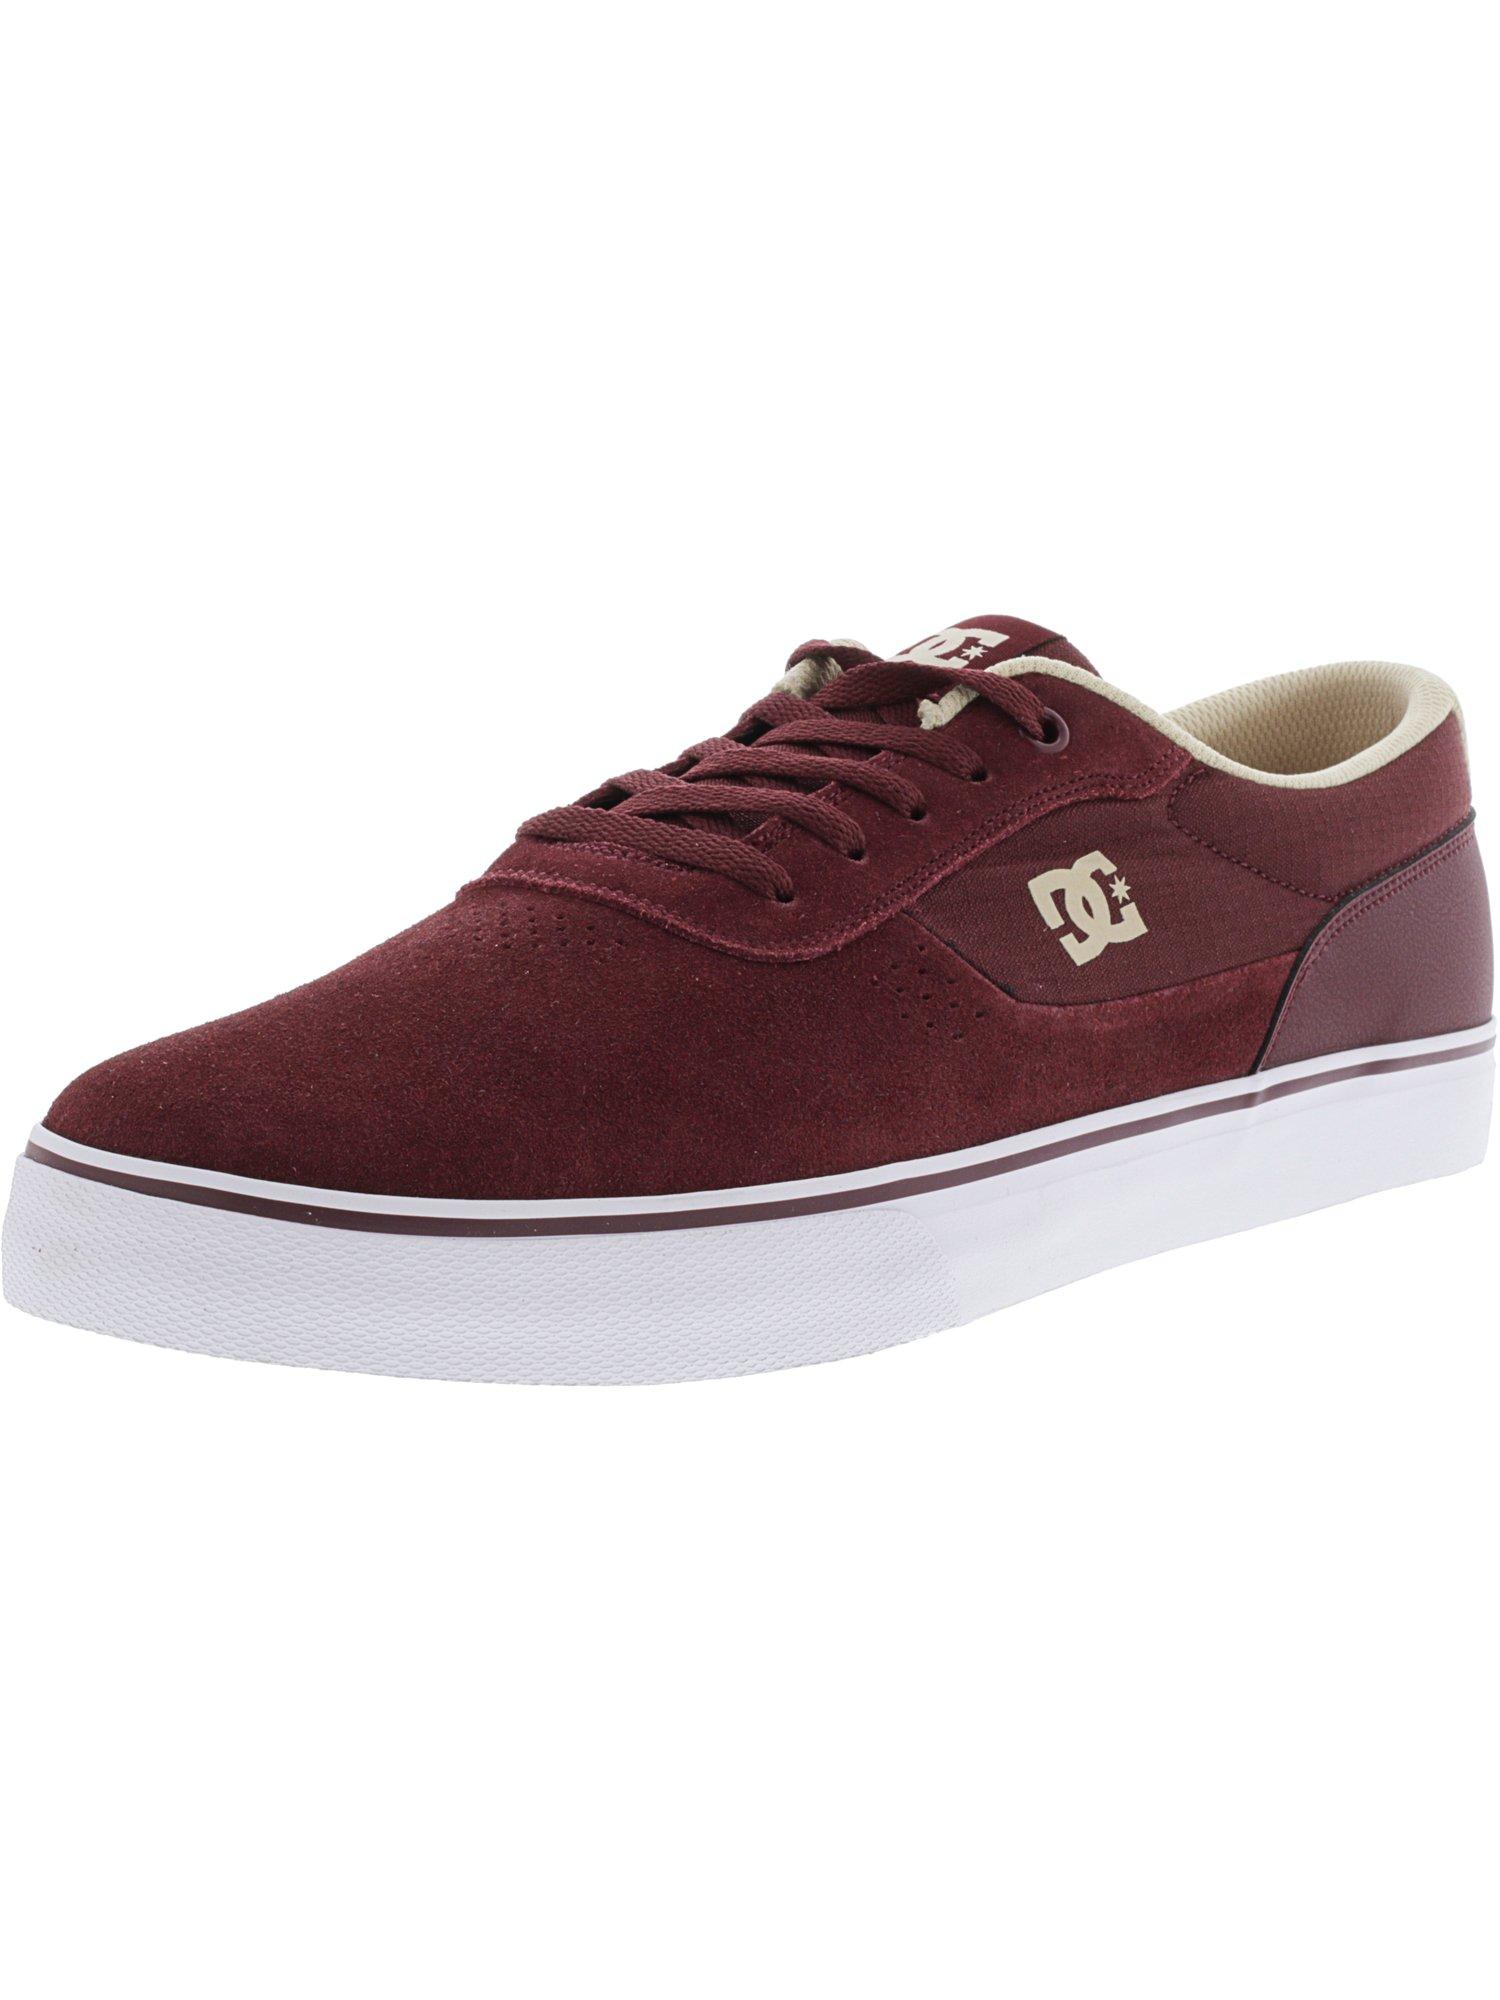 Dc Men's Switch S Black / Light Grey Ankle-High Leather Skateboarding Shoe - 12M